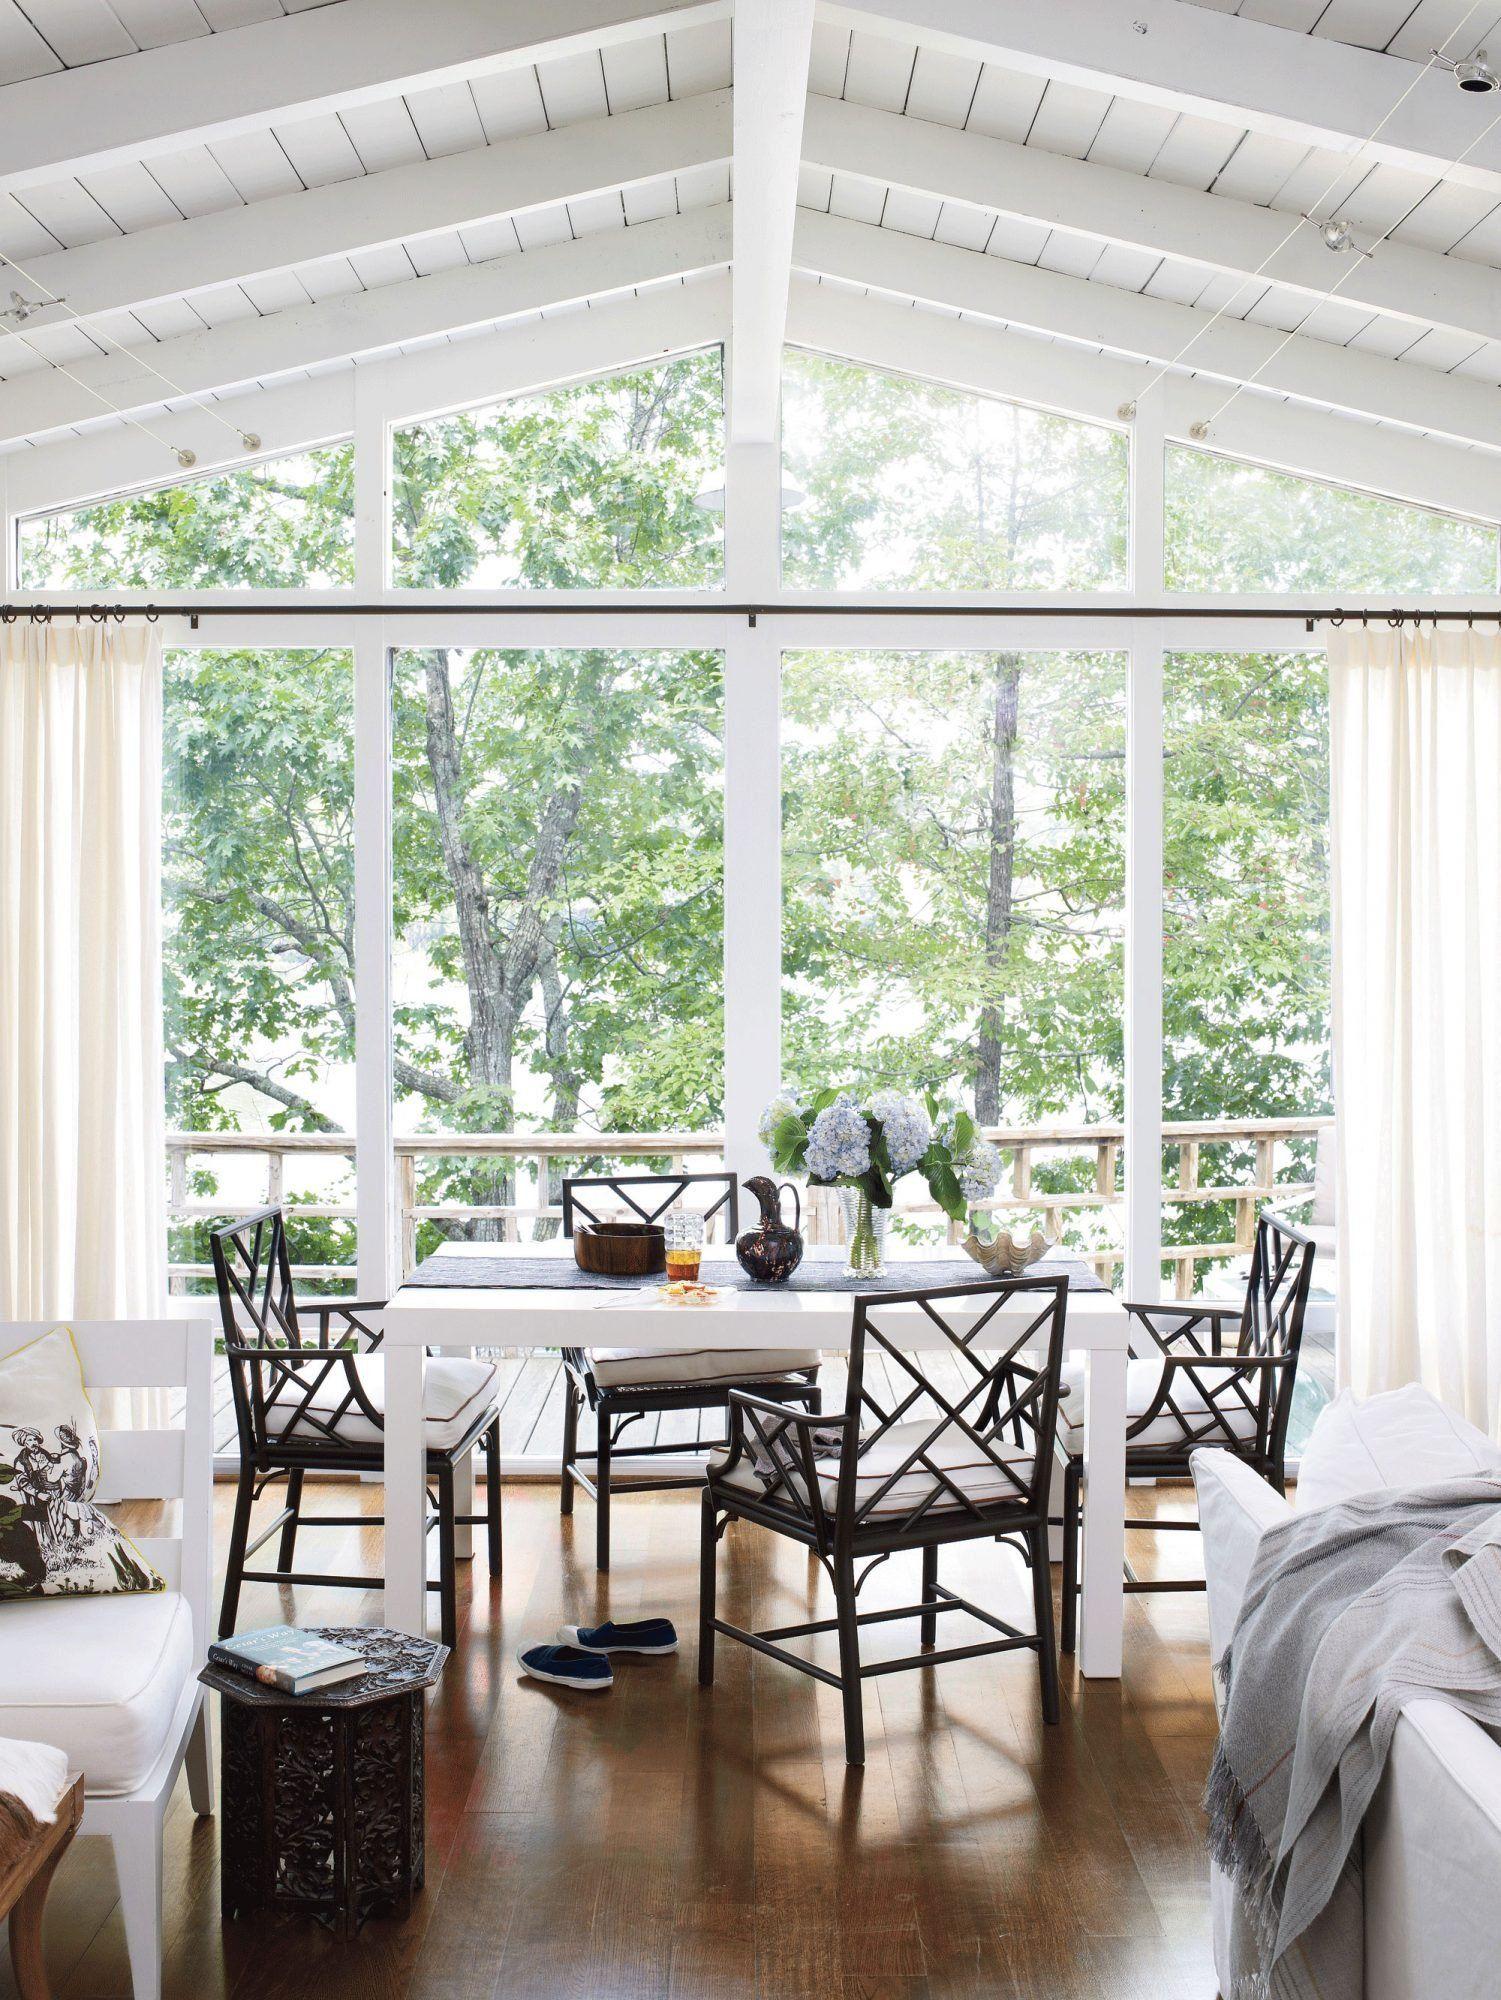 Photo of Lake House Furniture and Decor Lake House Decorating Ideas Lake Decor You Ll Lov…